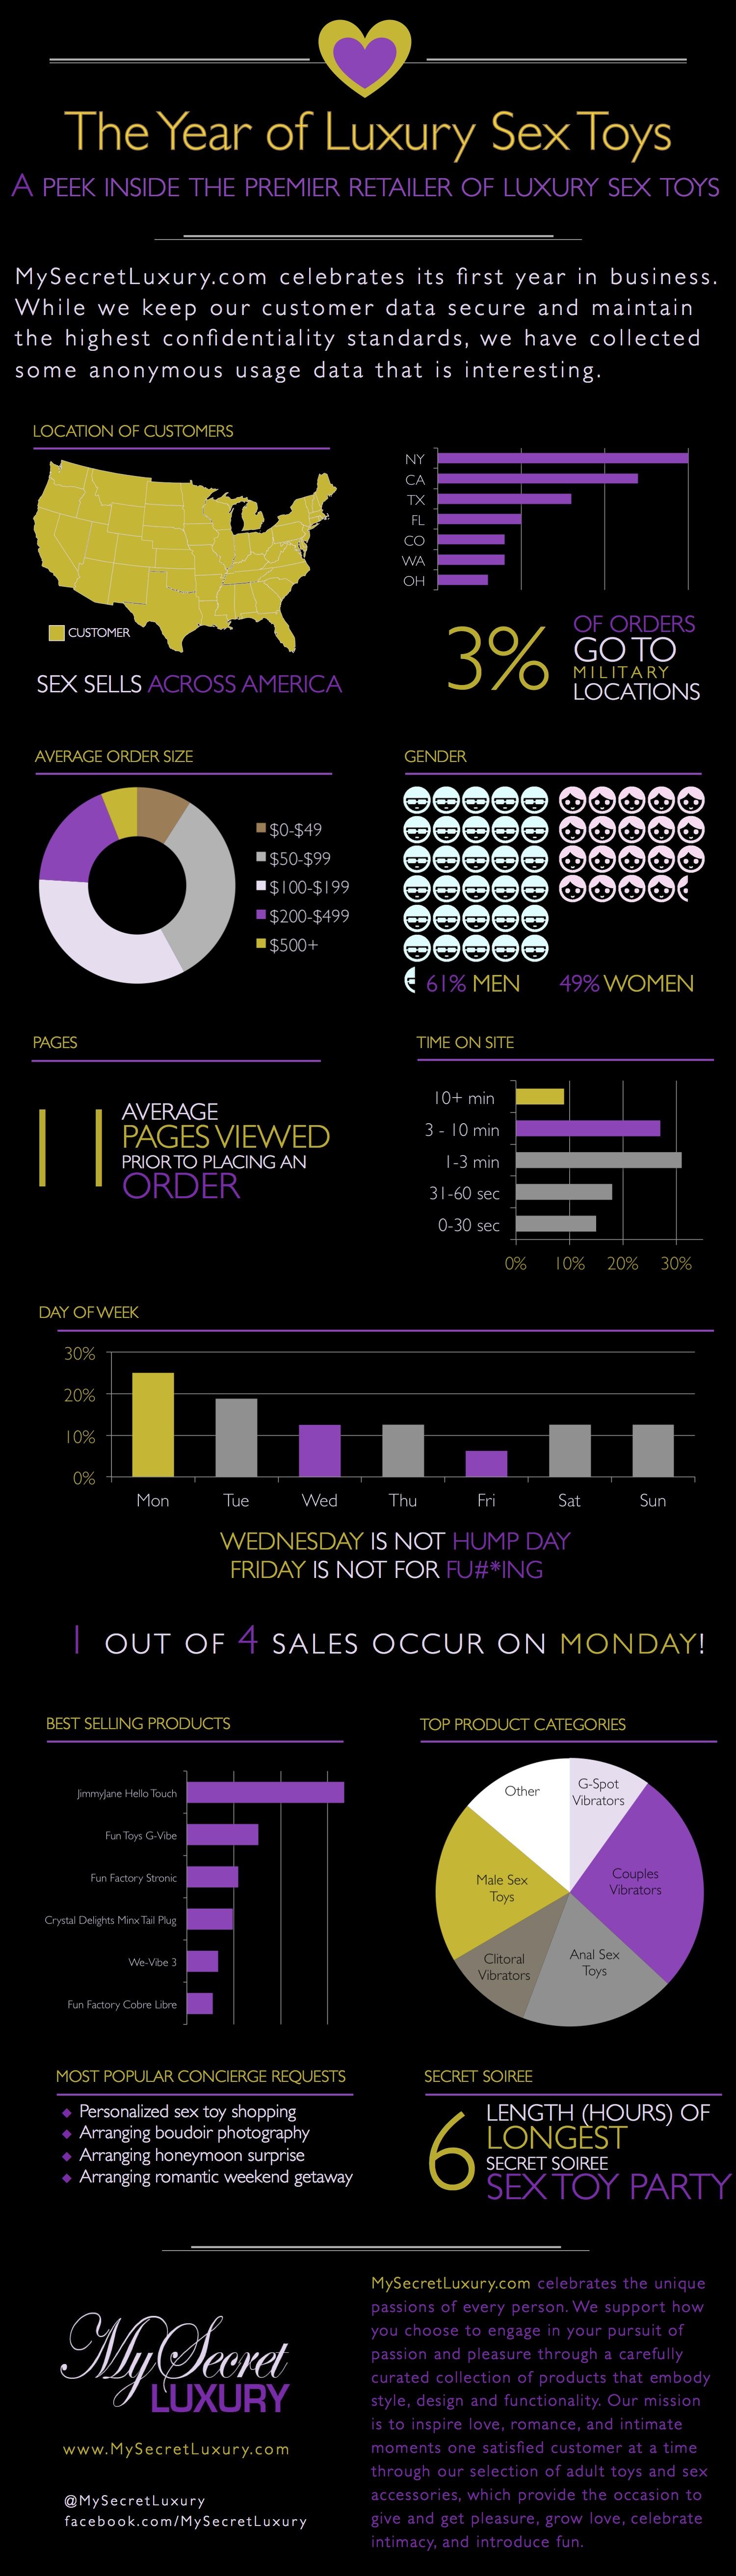 my-secret-luxury-infographic-sept-2013.jpg